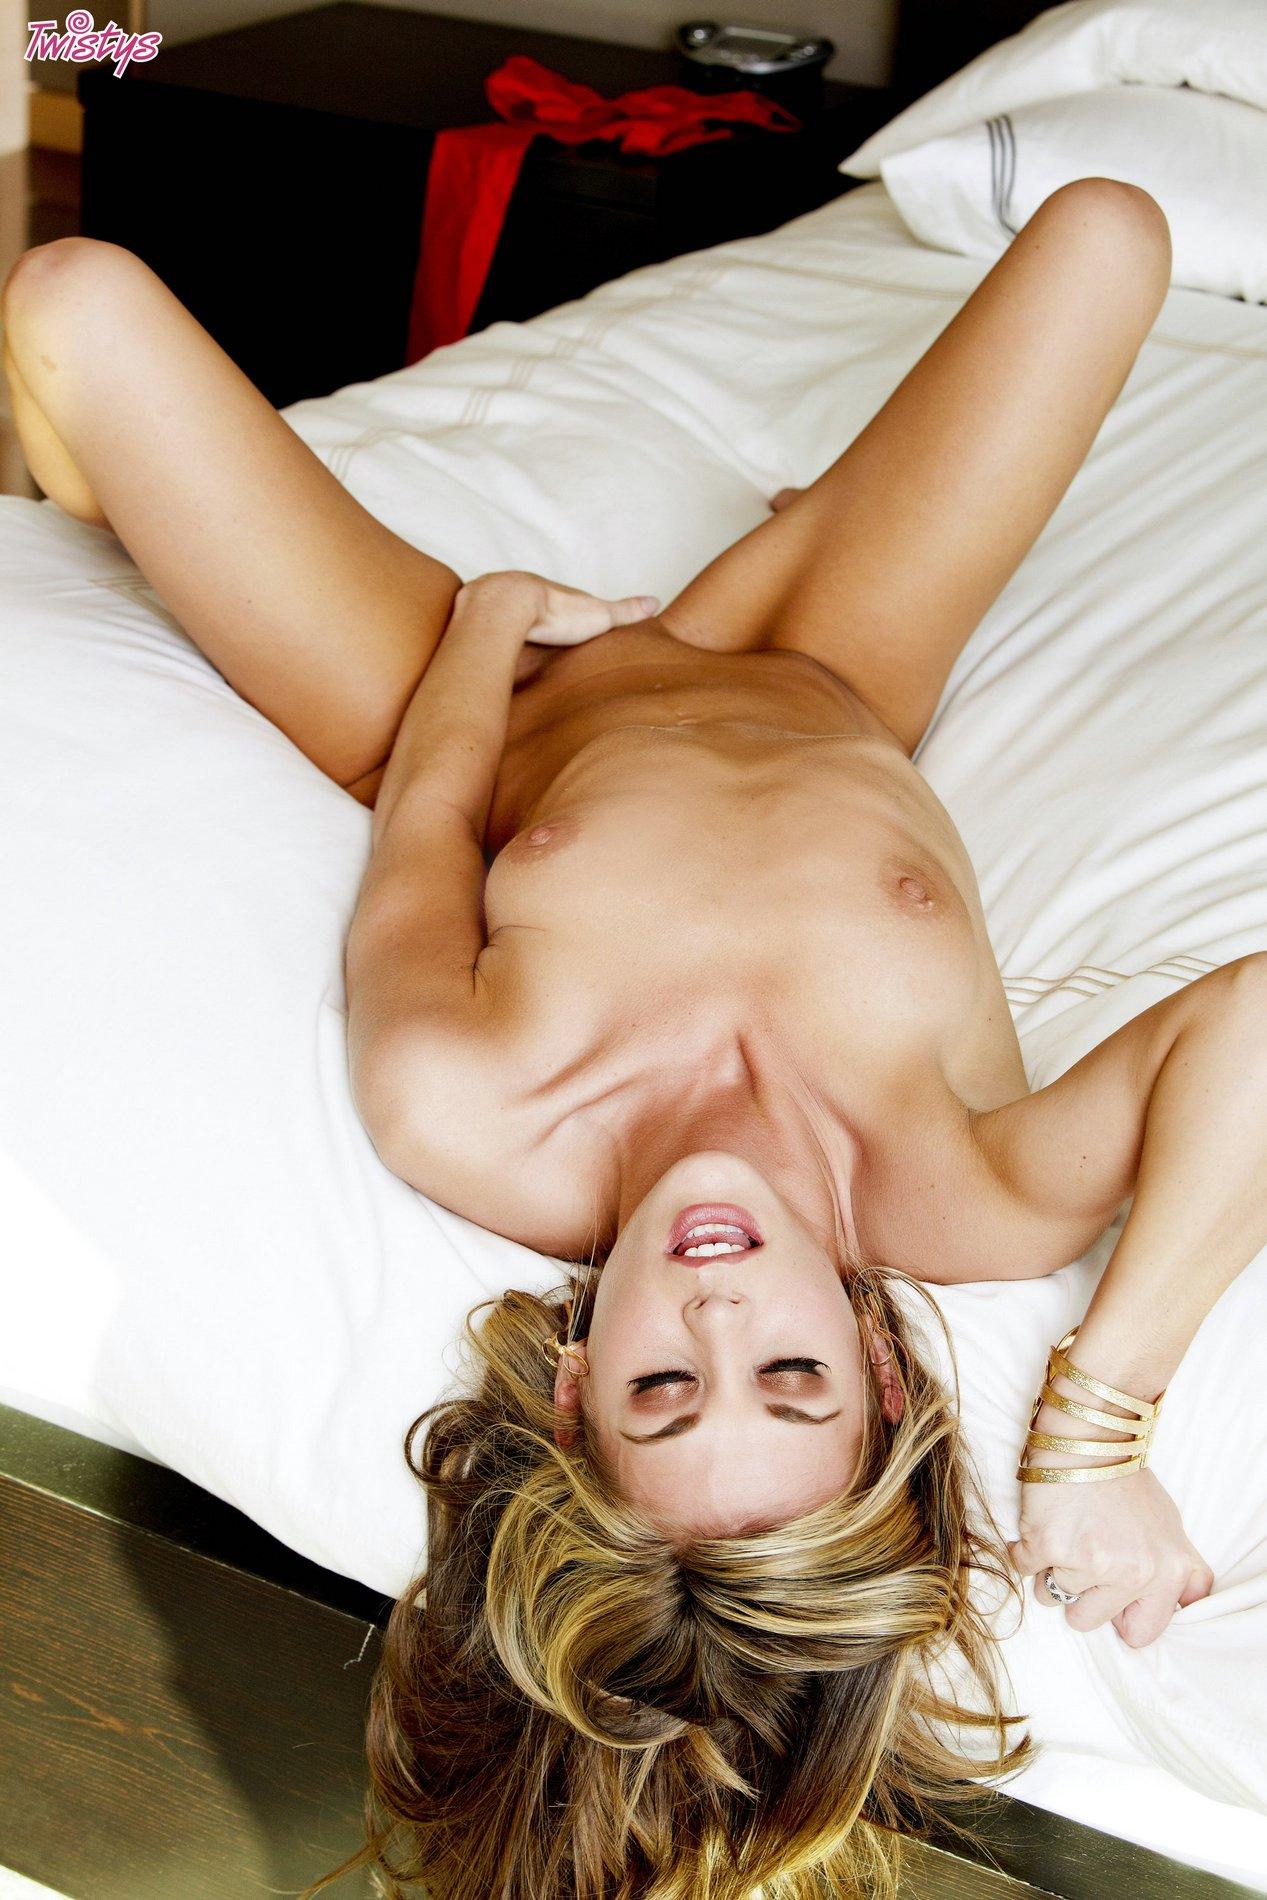 Beautiful blonde pov interracial fuck hardcore pussy sex big black cock 3